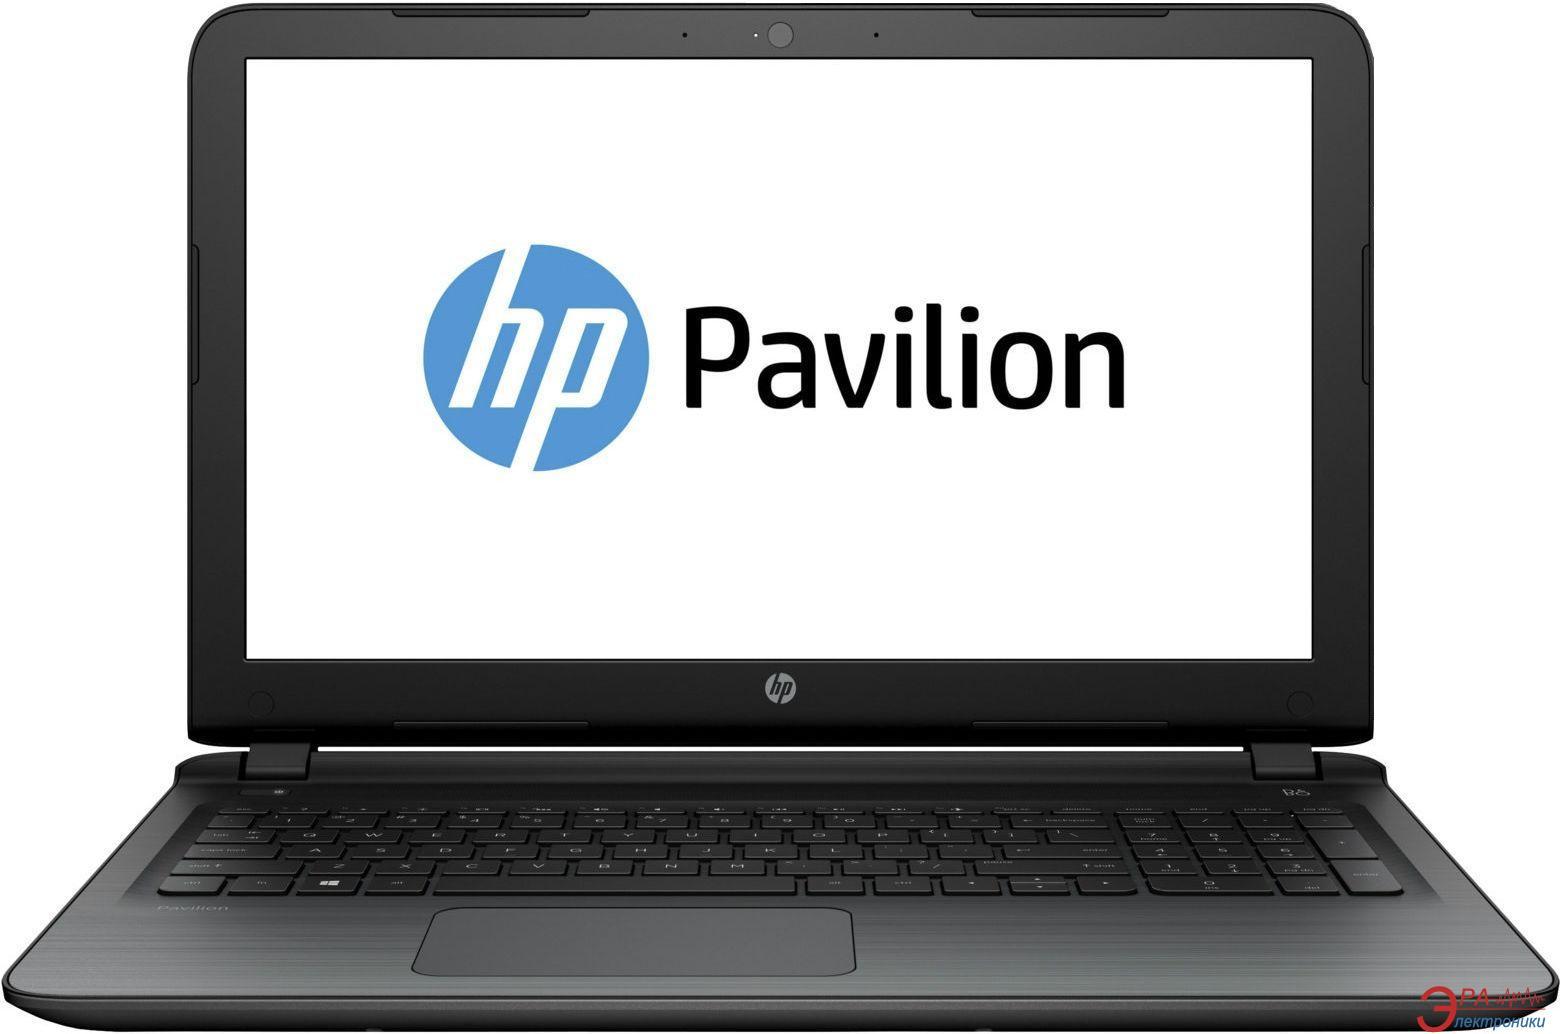 Ноутбук HP Pavilion 15-ab206ur (P0S32EA) Black 15,6